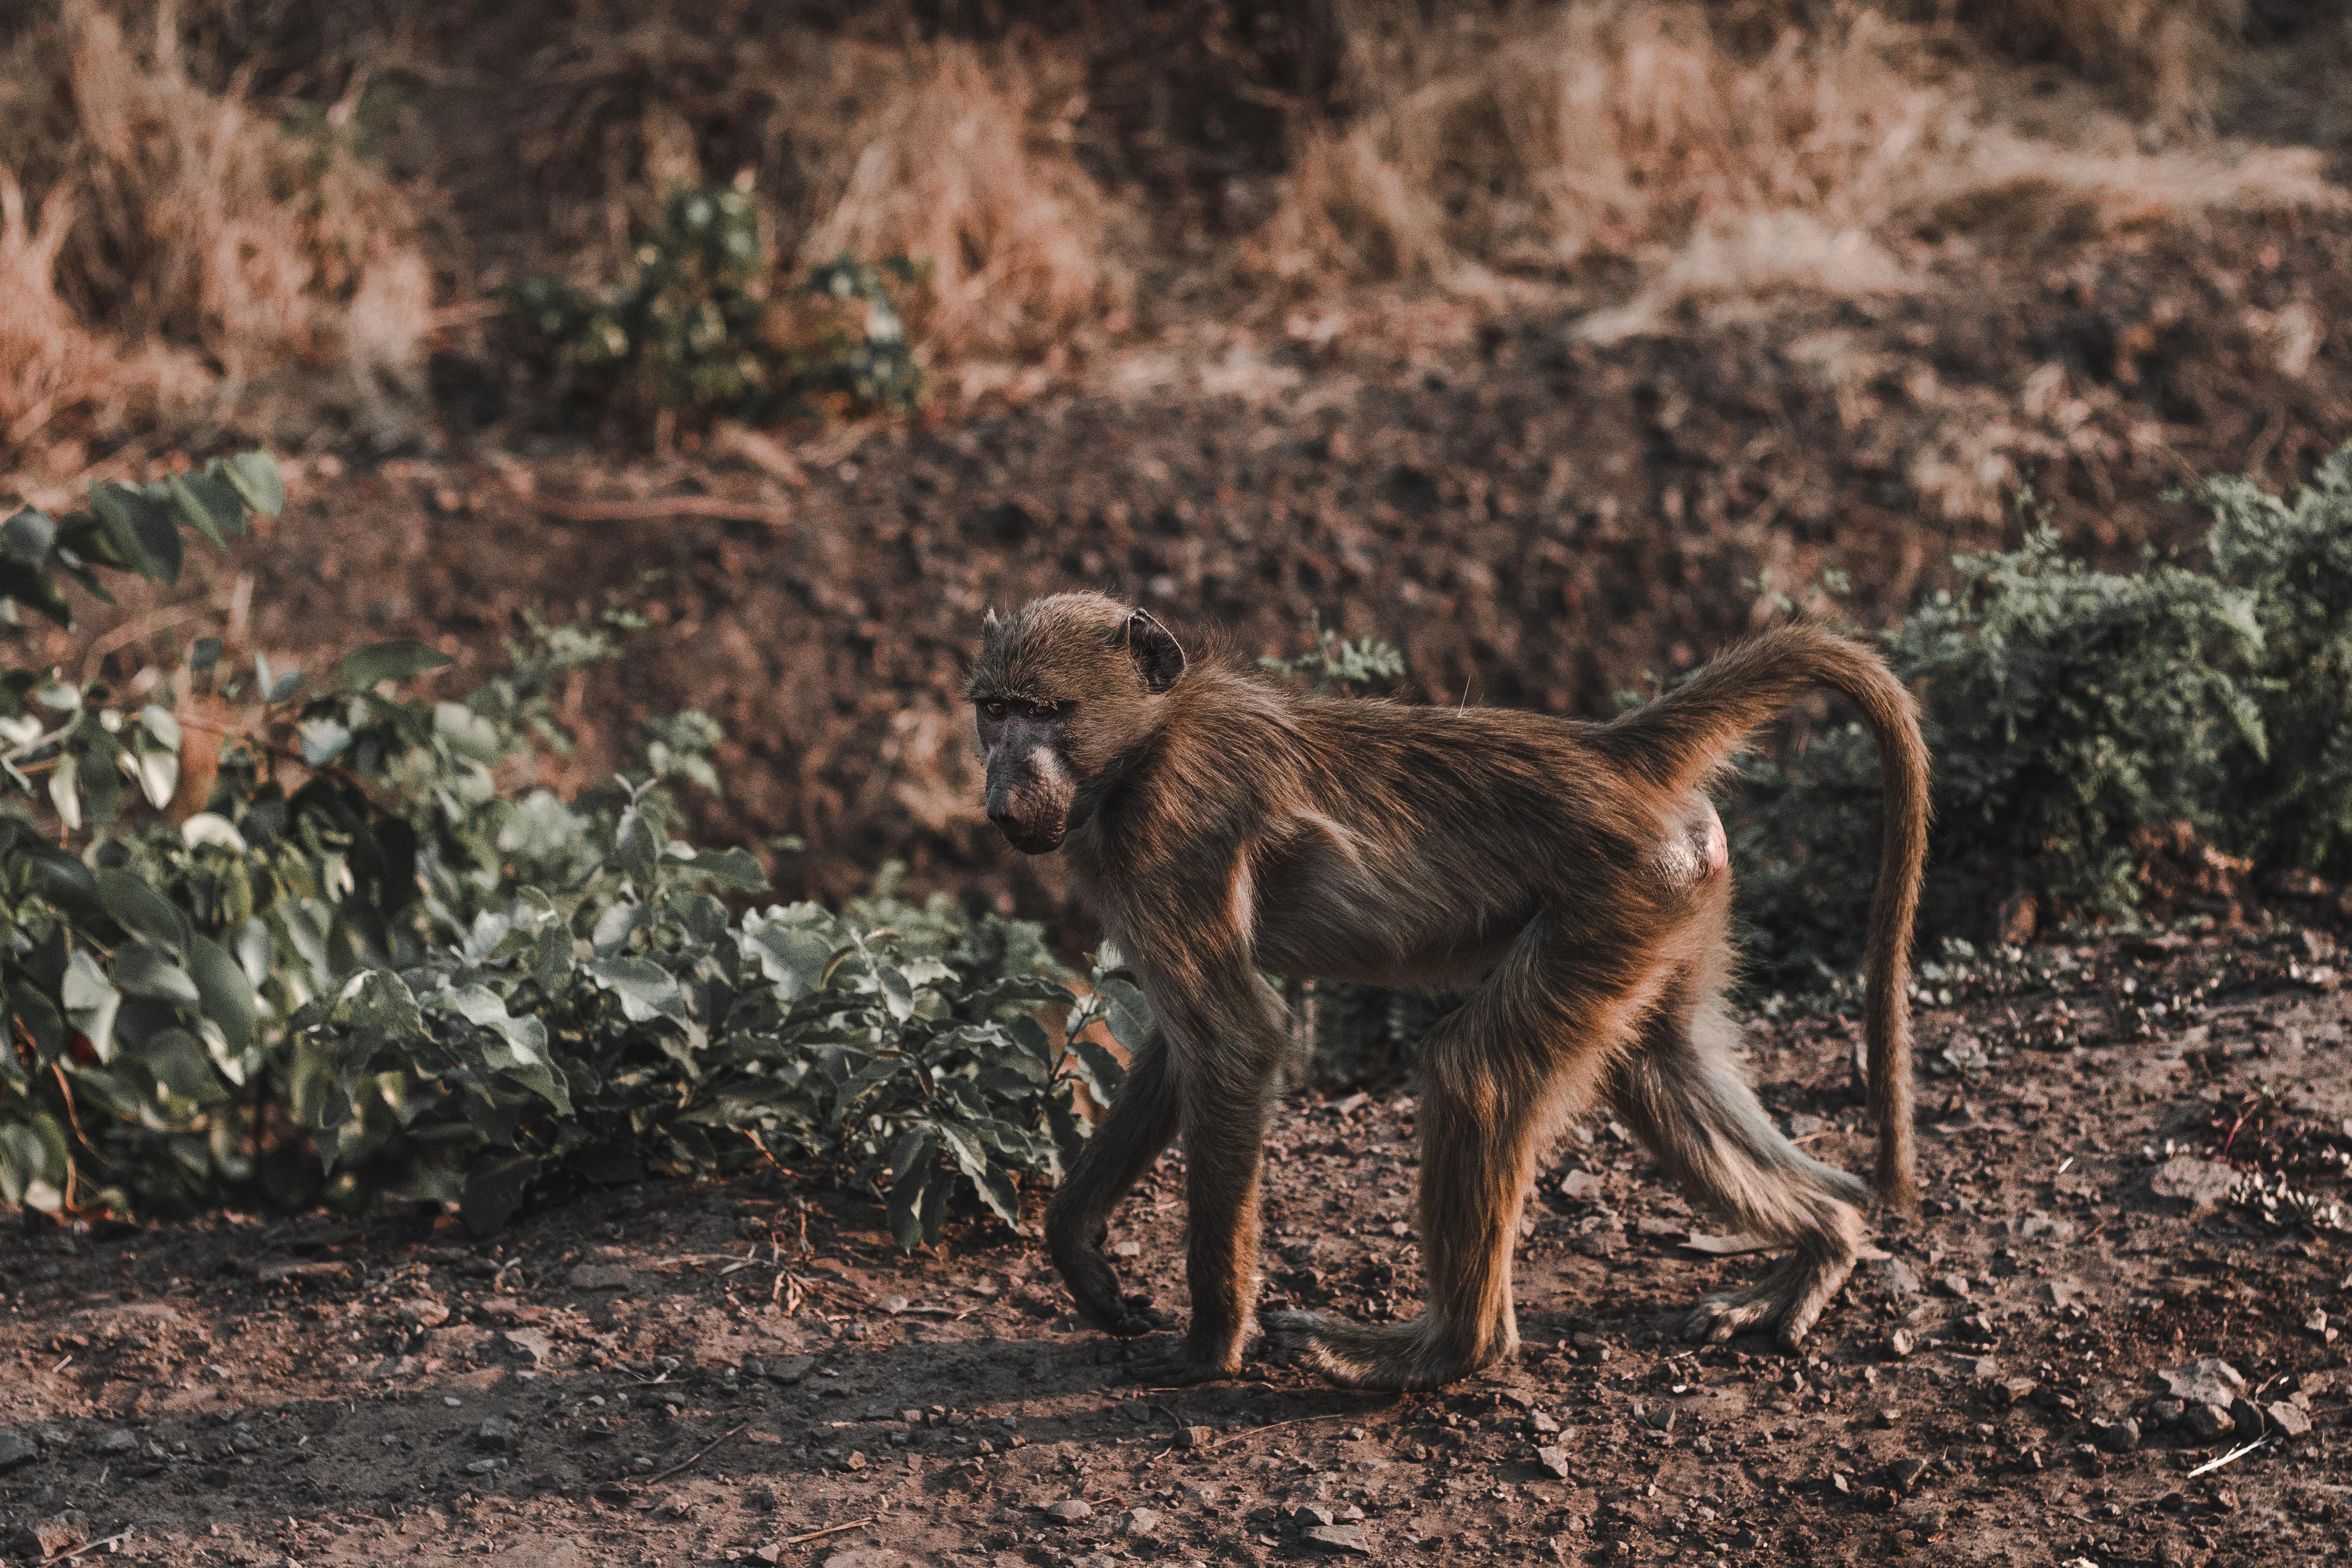 brown chimpanzee walking on ground beside grass